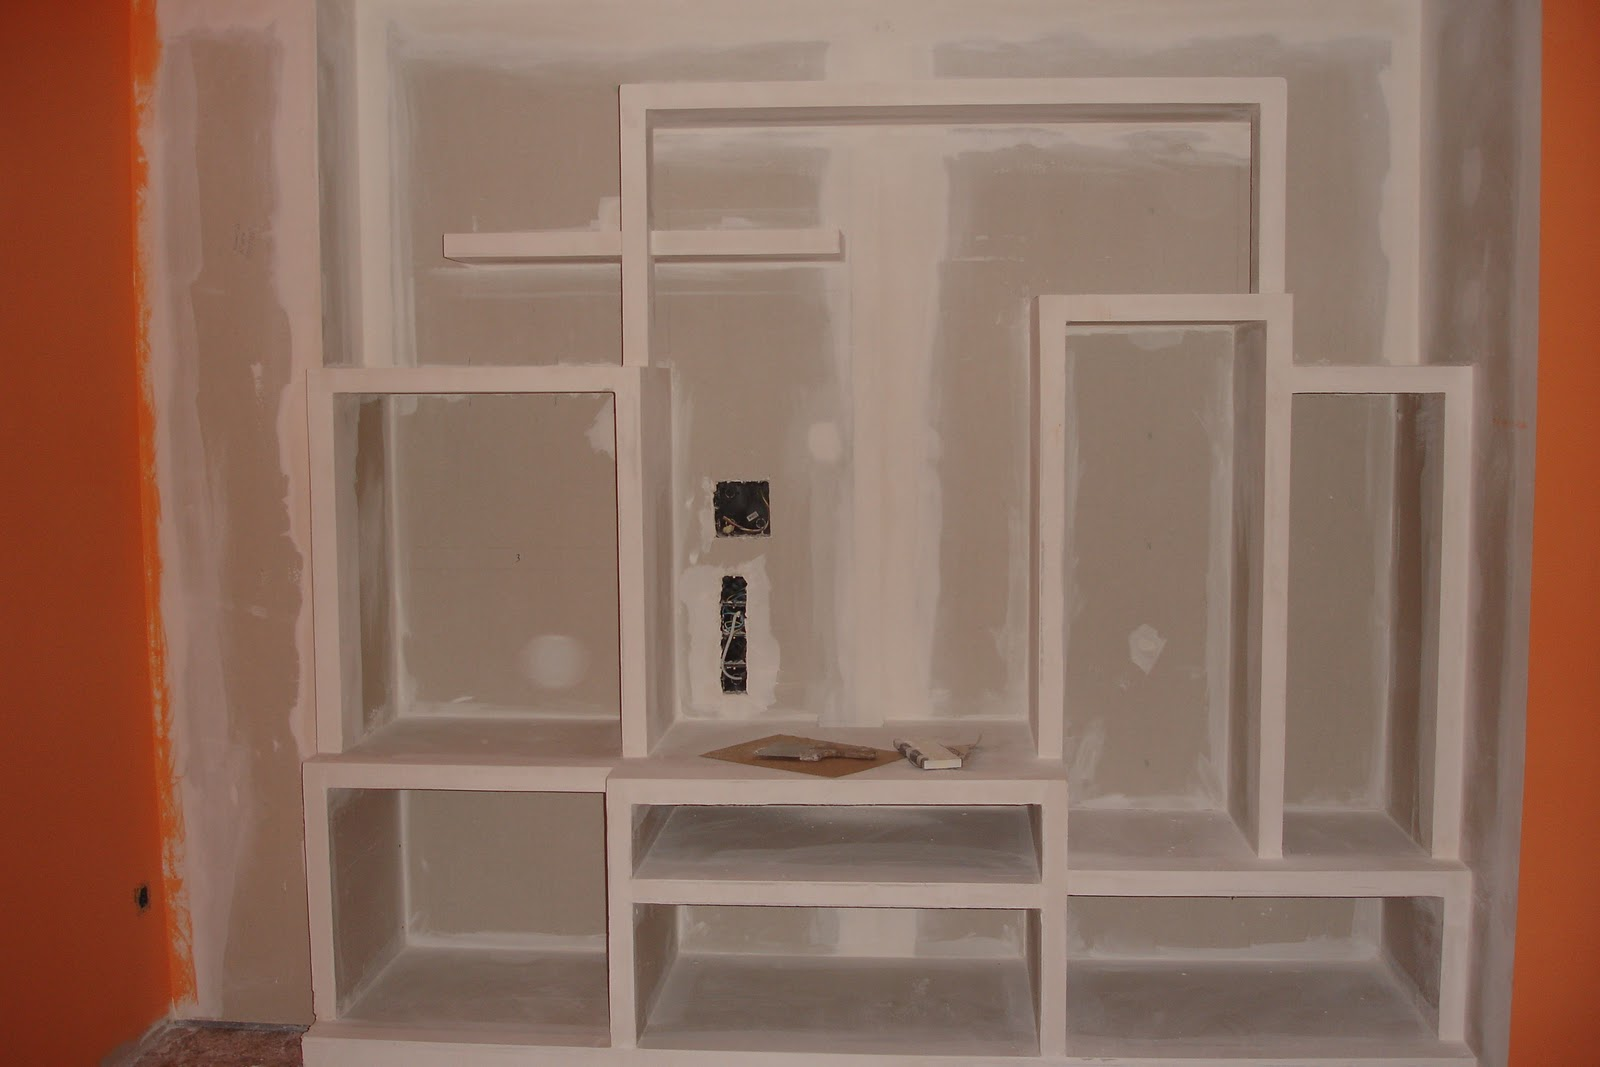 Reformas canosa pladur techos tabiques muebles - Muebles en pladur ...